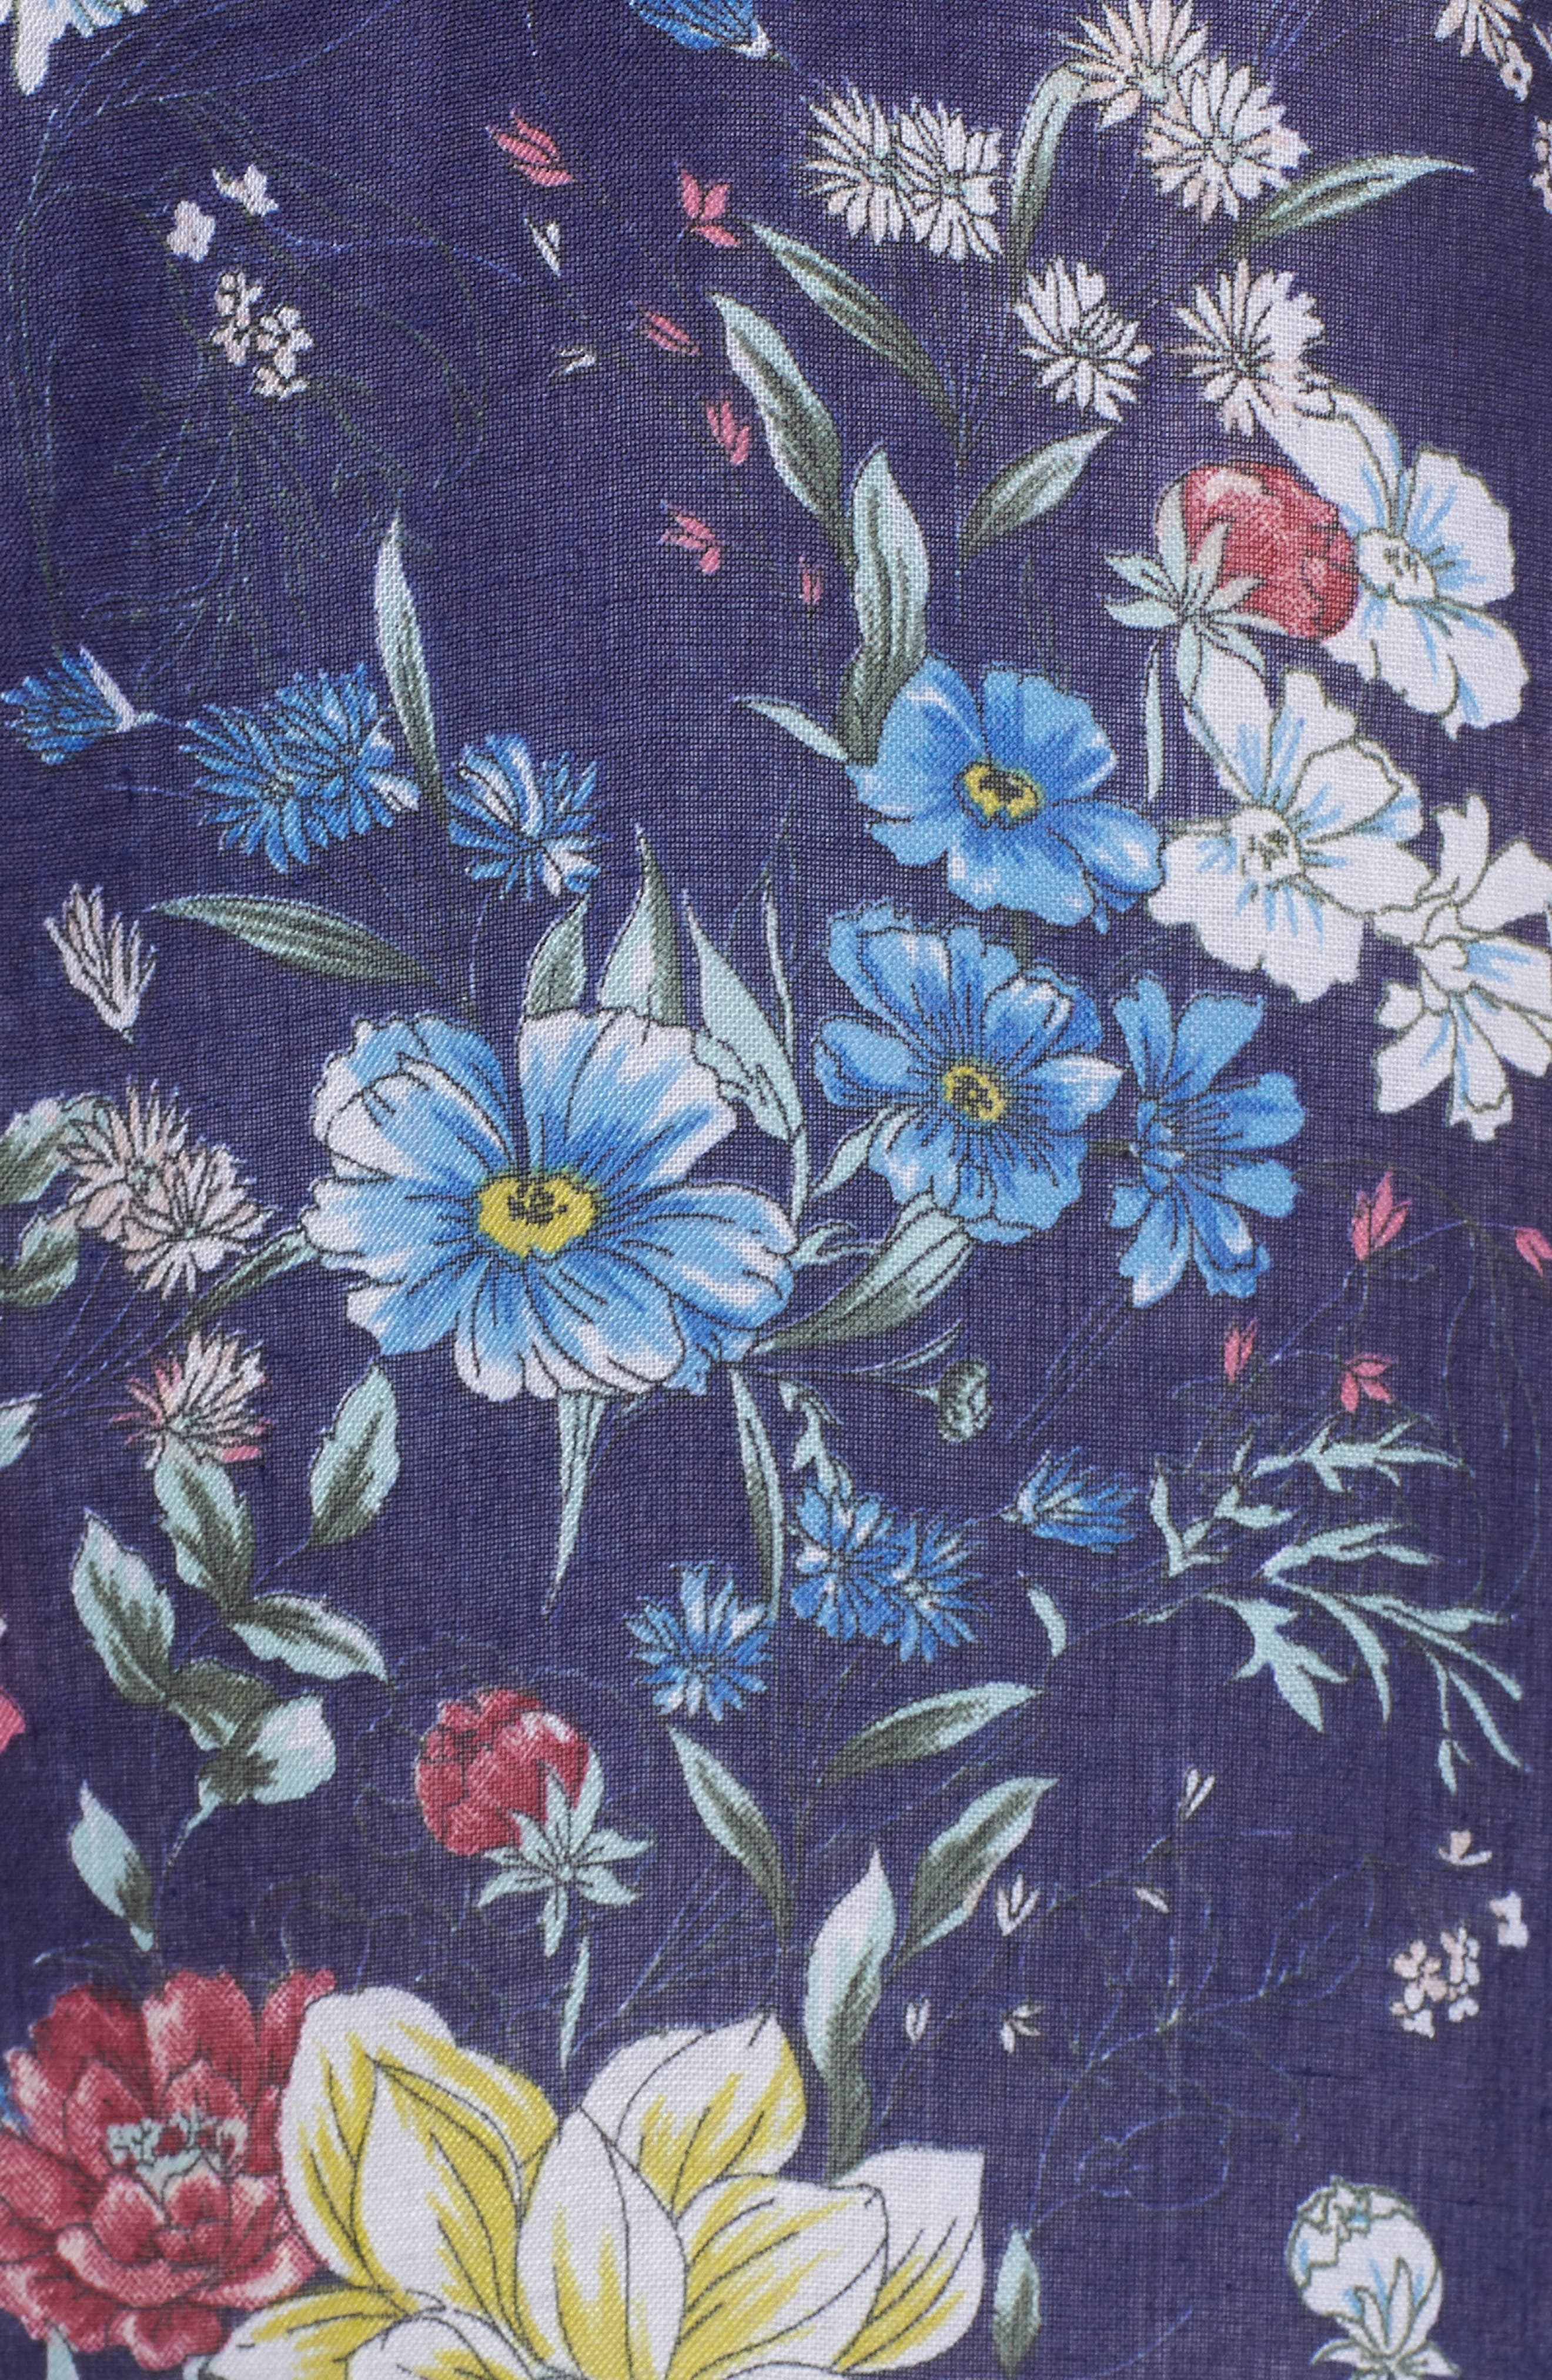 Floral Kimono Duster,                             Alternate thumbnail 5, color,                             Navy